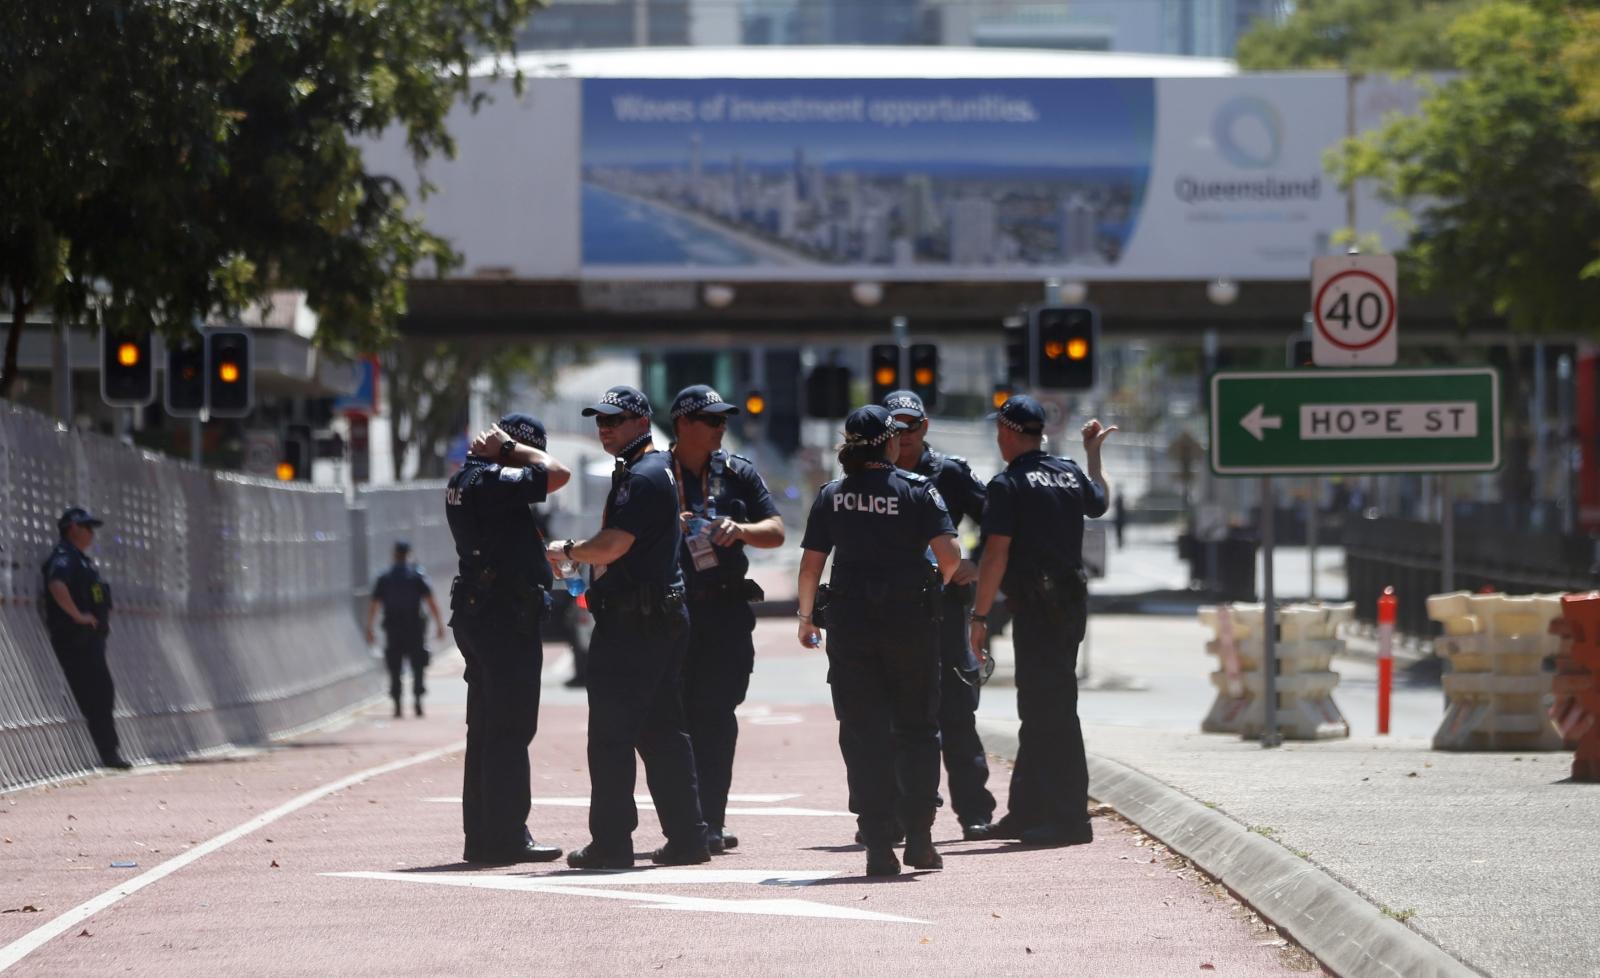 G20 summit security